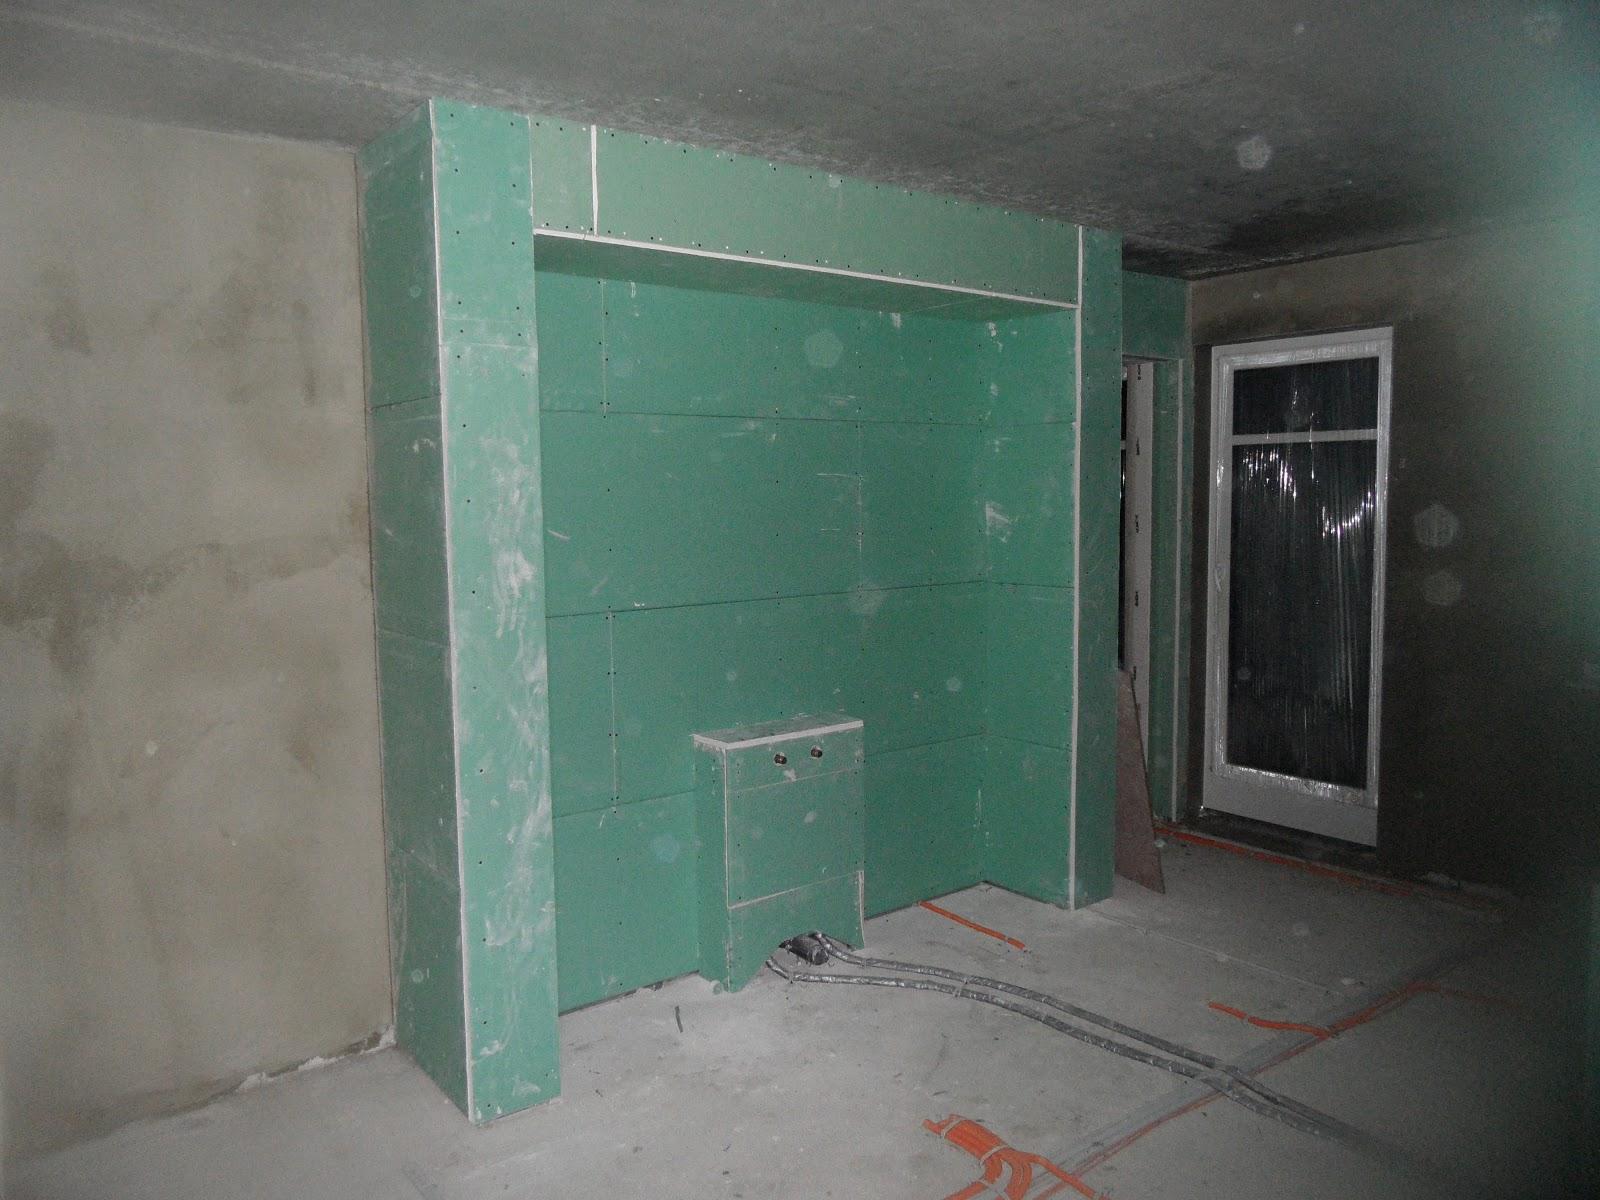 Bautagebuch Jette Joop Europe life Trockenbau im Badezimmer  Dachboden